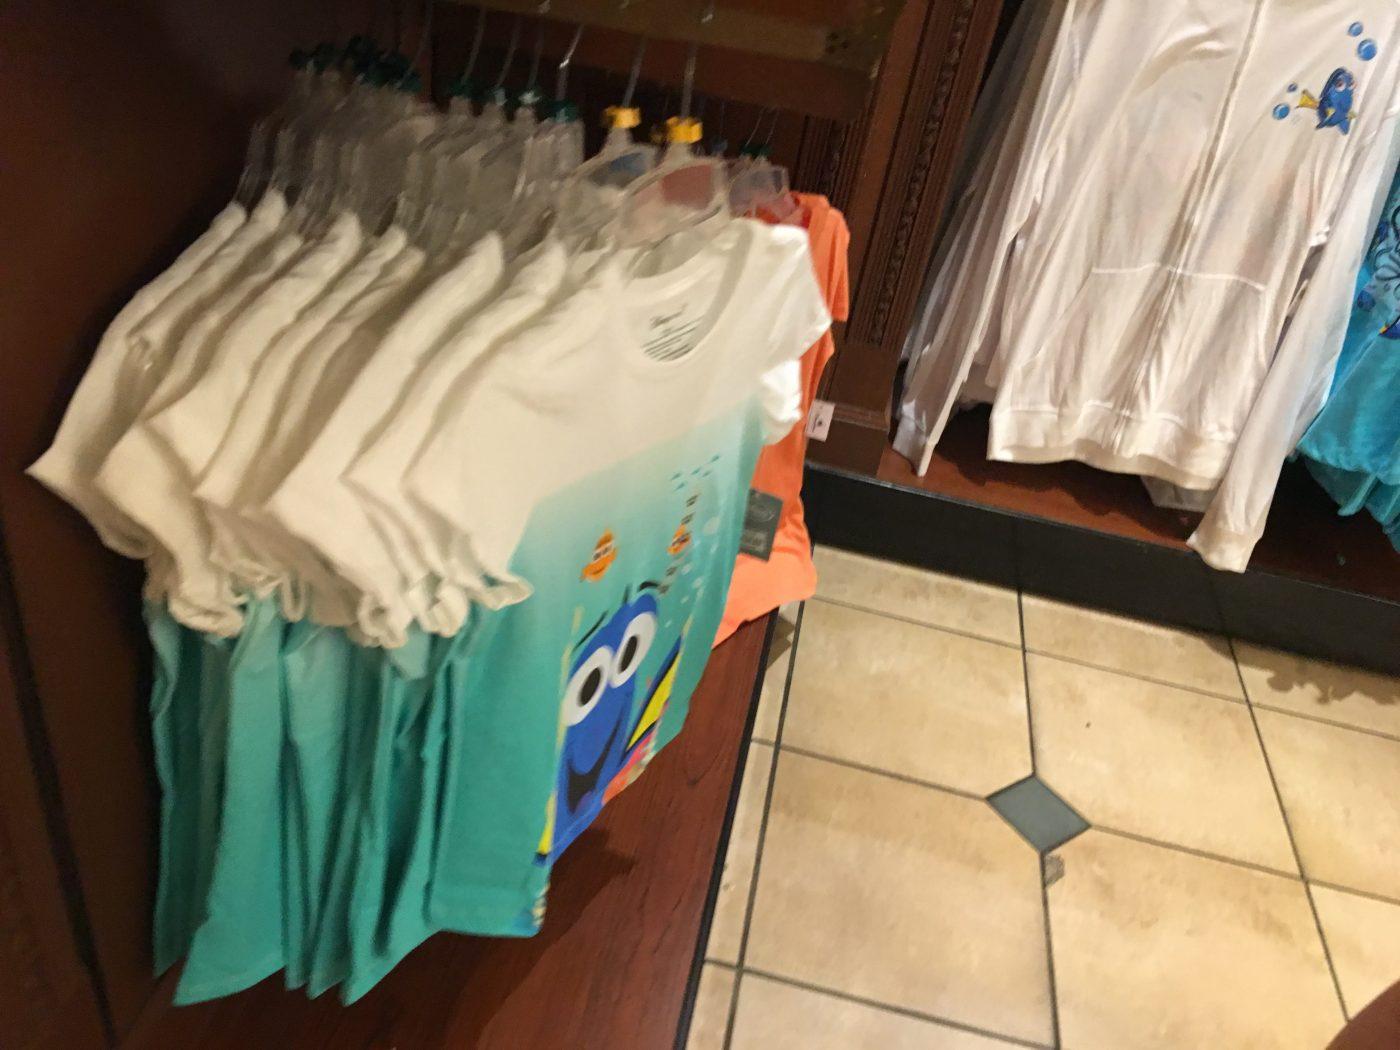 Disney-MagicKingdom-inside giftshop, Dory shirts